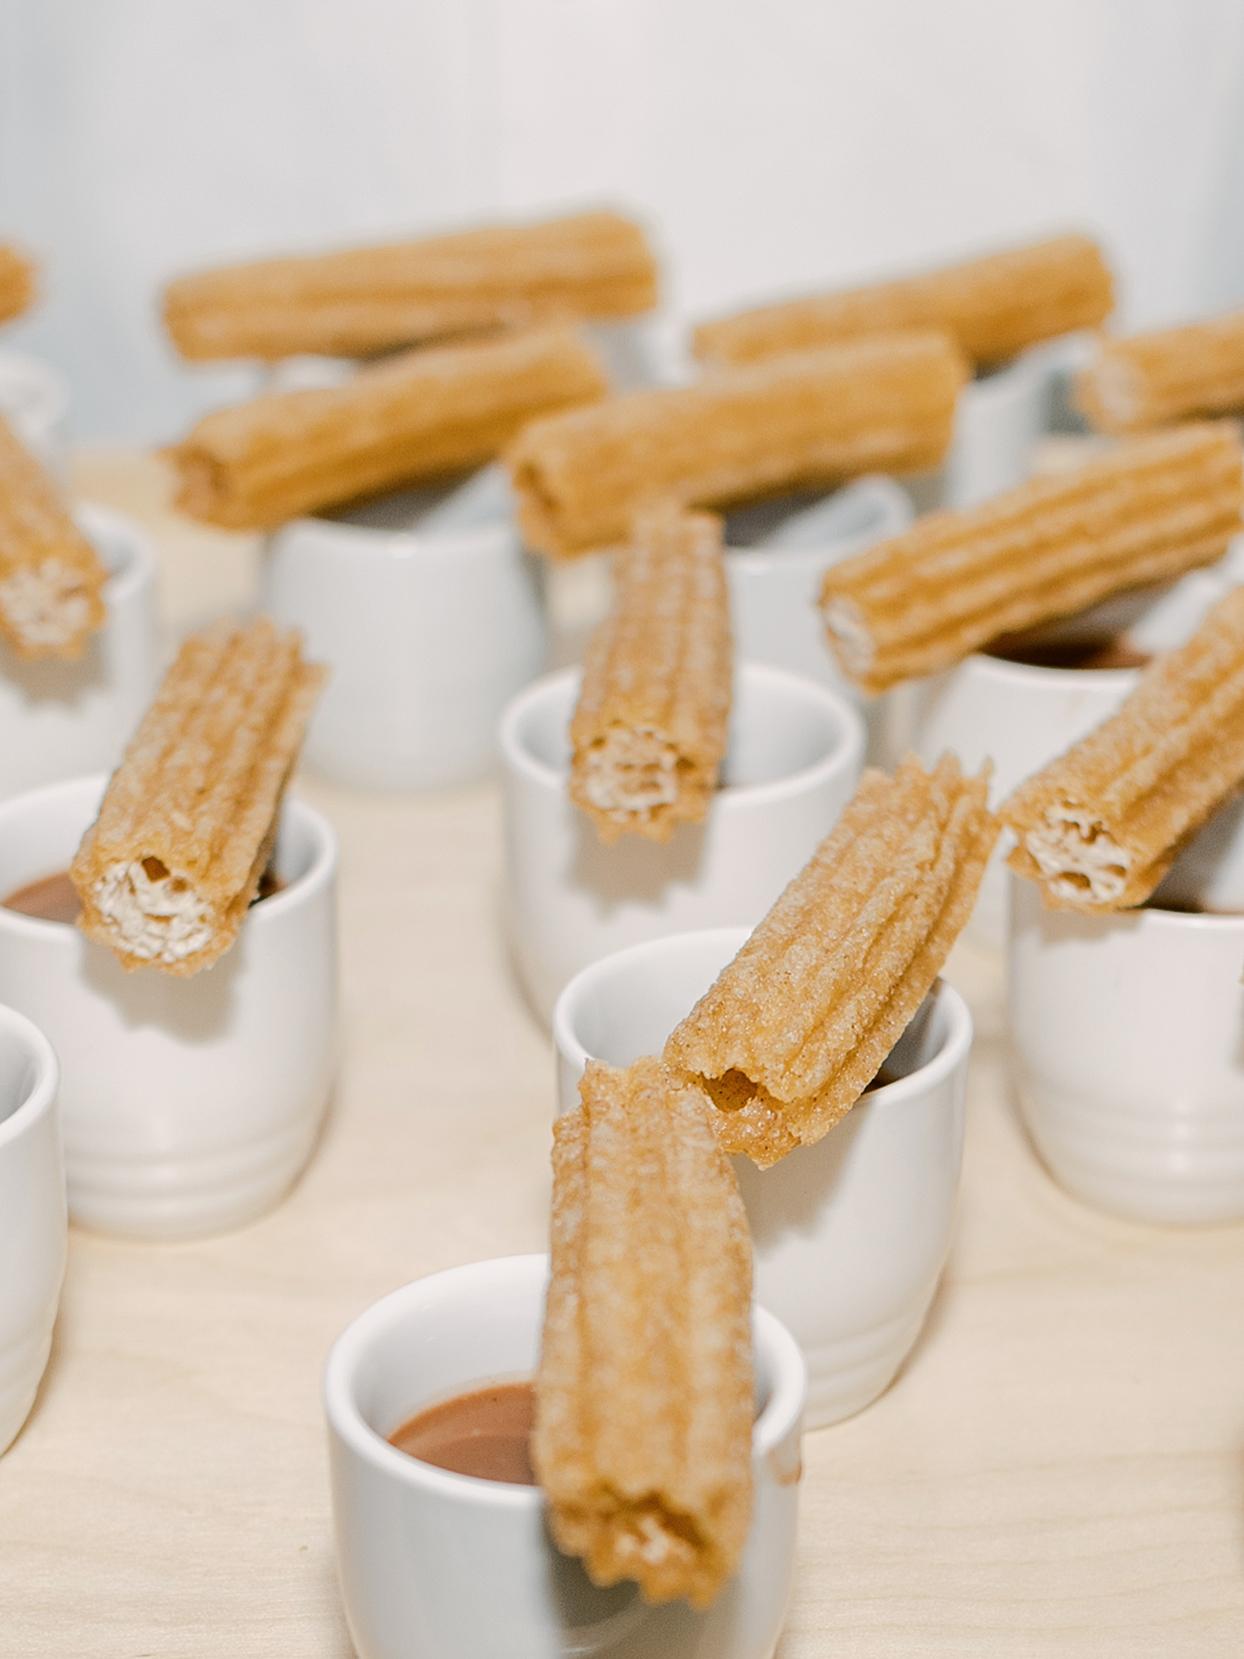 sofia alberto wedding dessert churros and hot chocolate